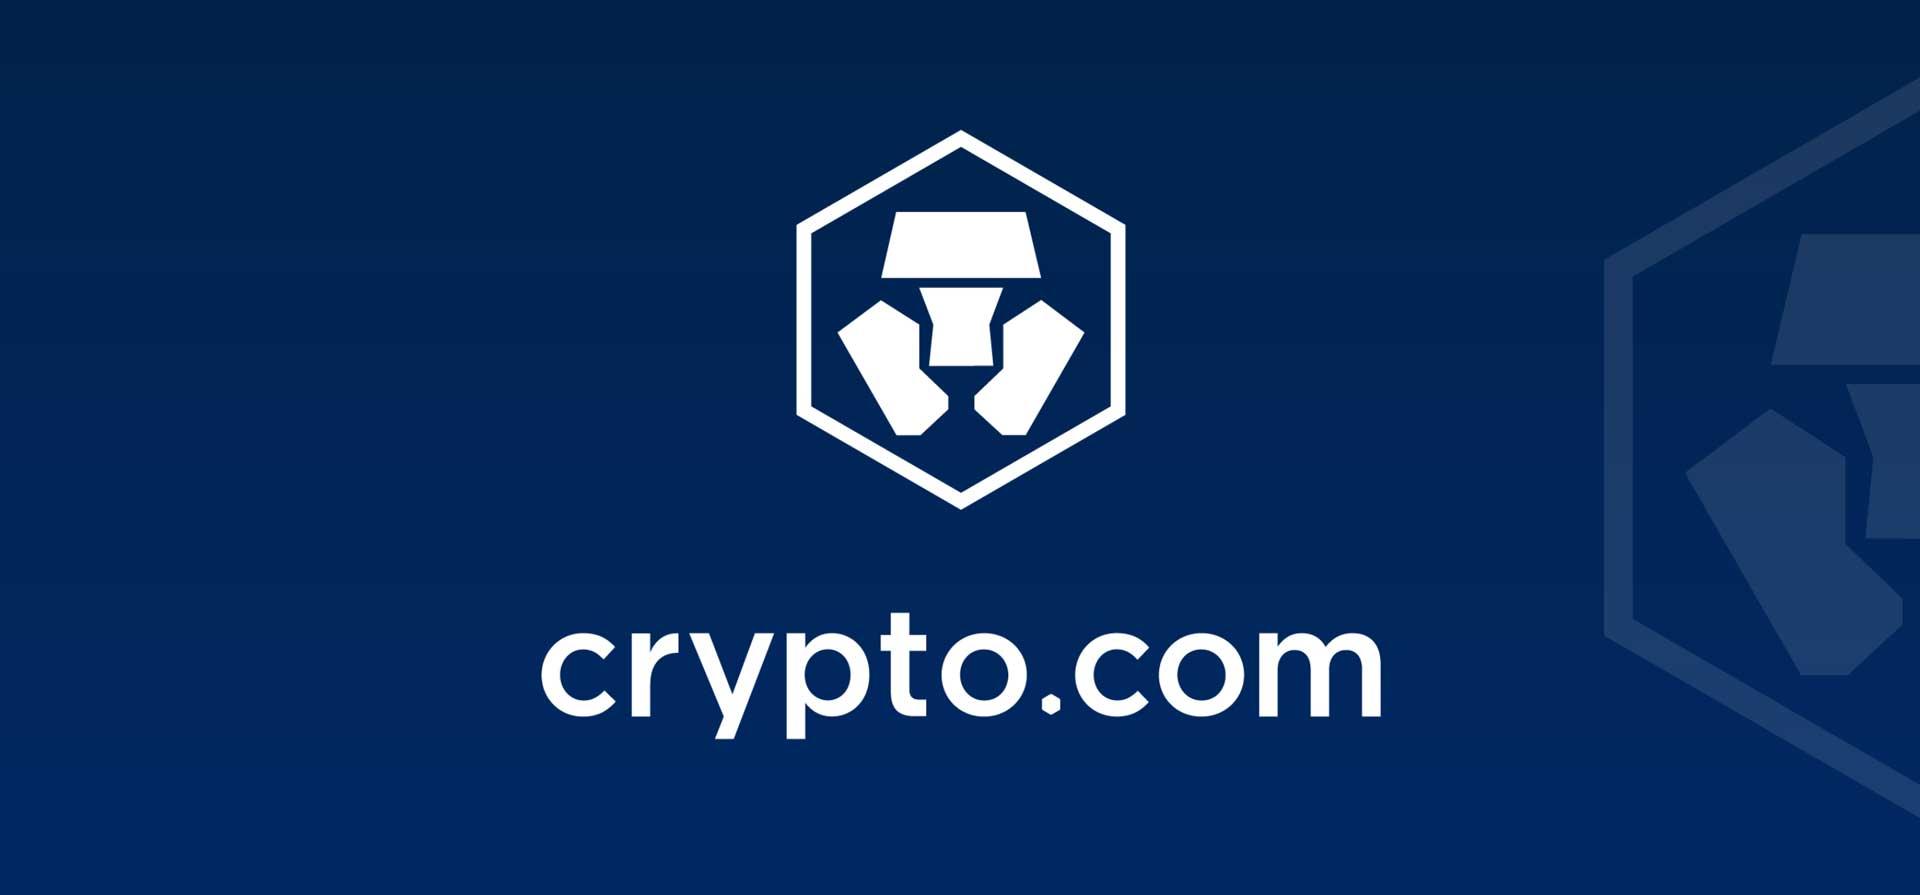 Crypto.com Your One Stop Crypto Solution